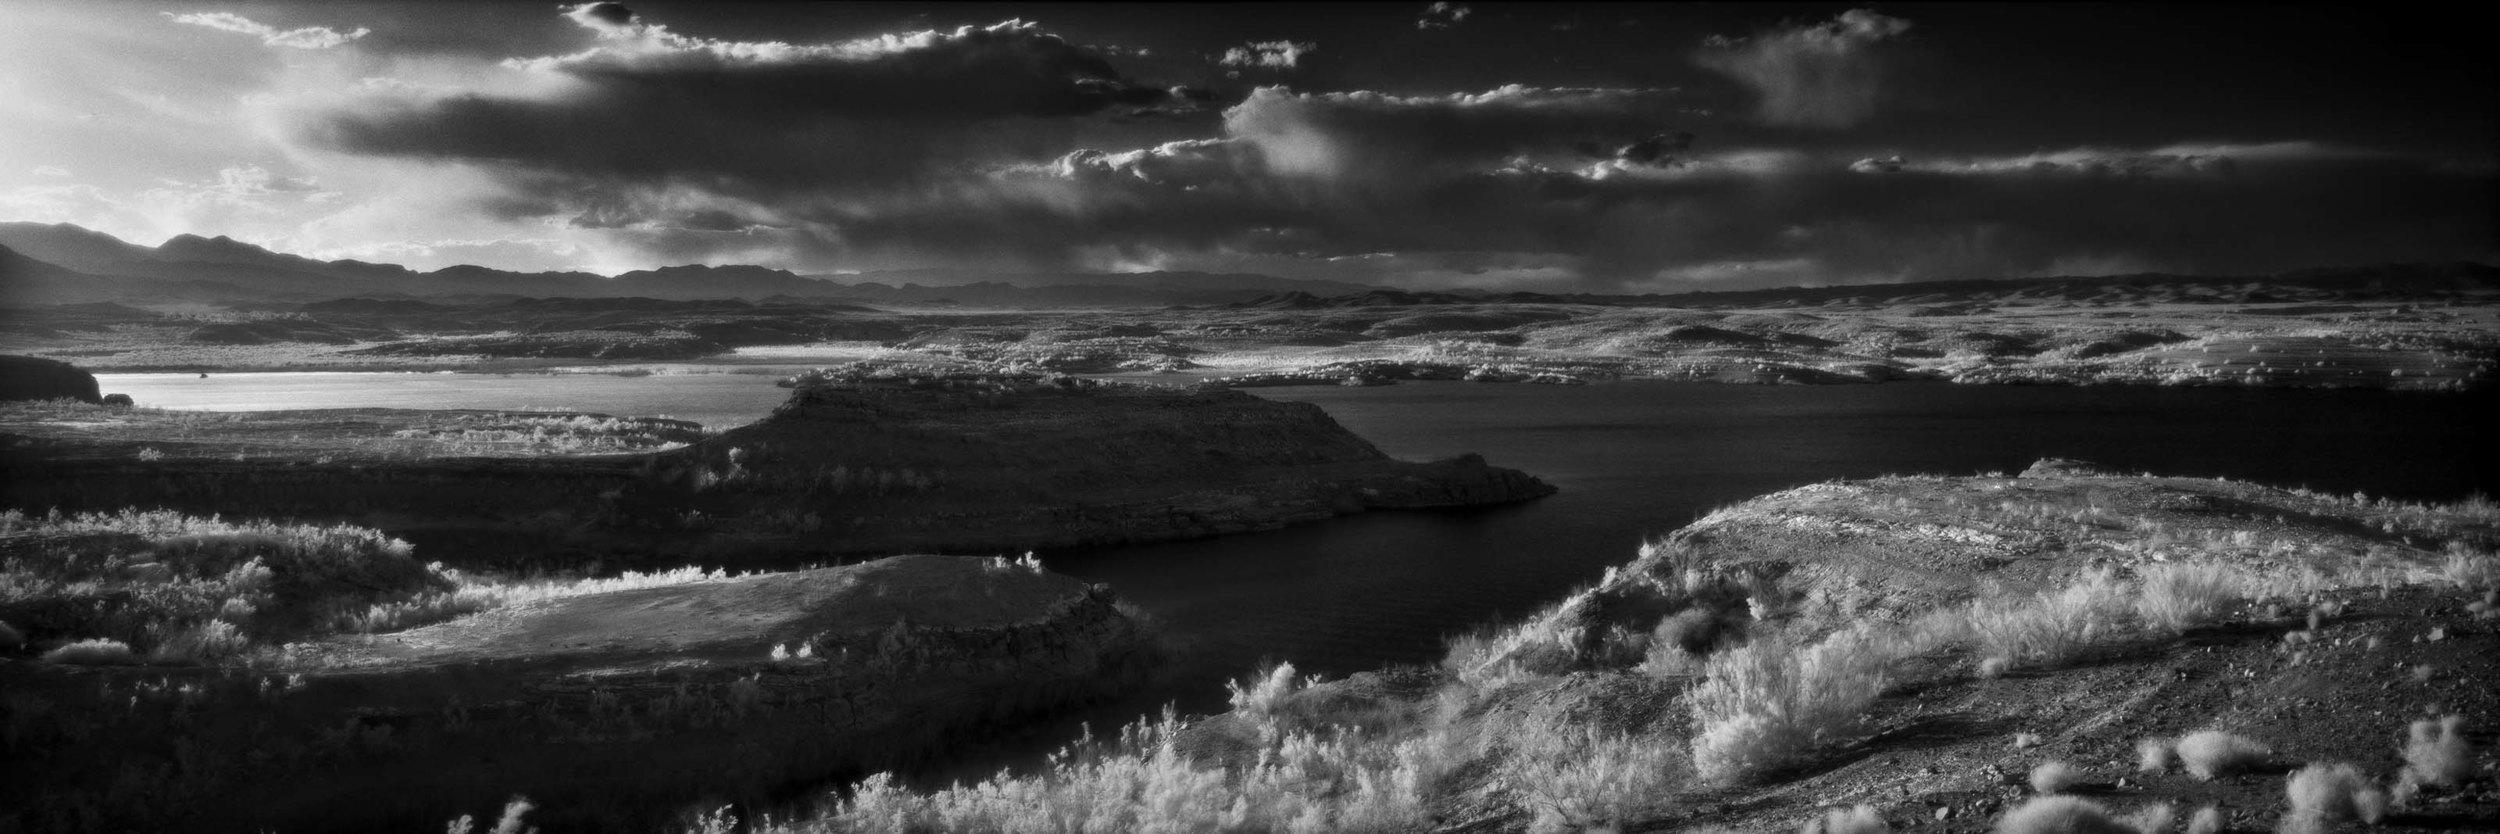 Las Vegas Wash into Lake Mead #2